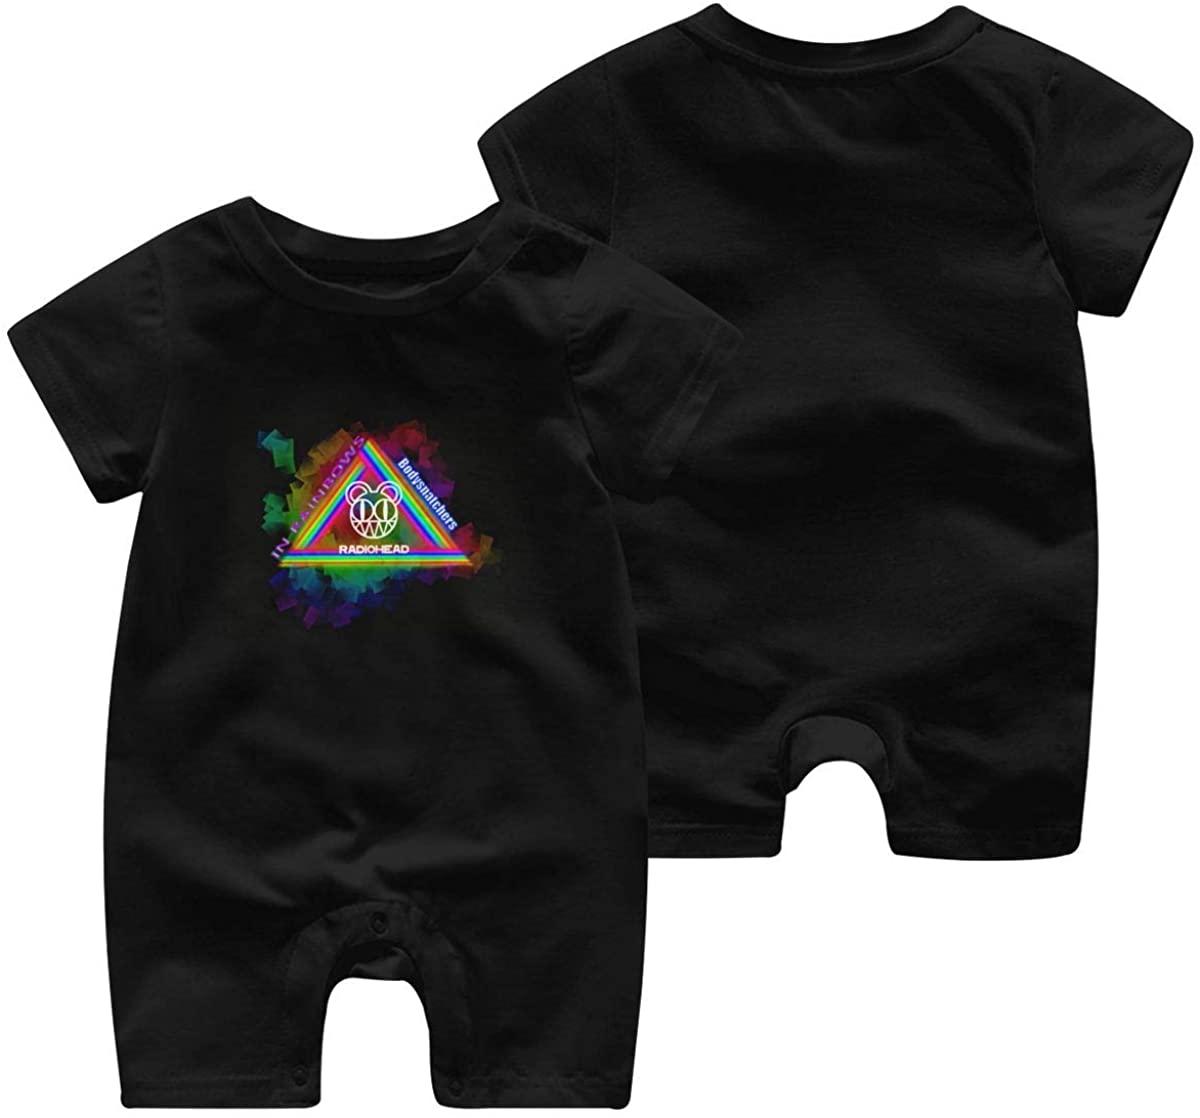 5husihai Radiohead 1-24 Months Boy Girl Baby Short Sleeve Creeper Jumpsuit Black